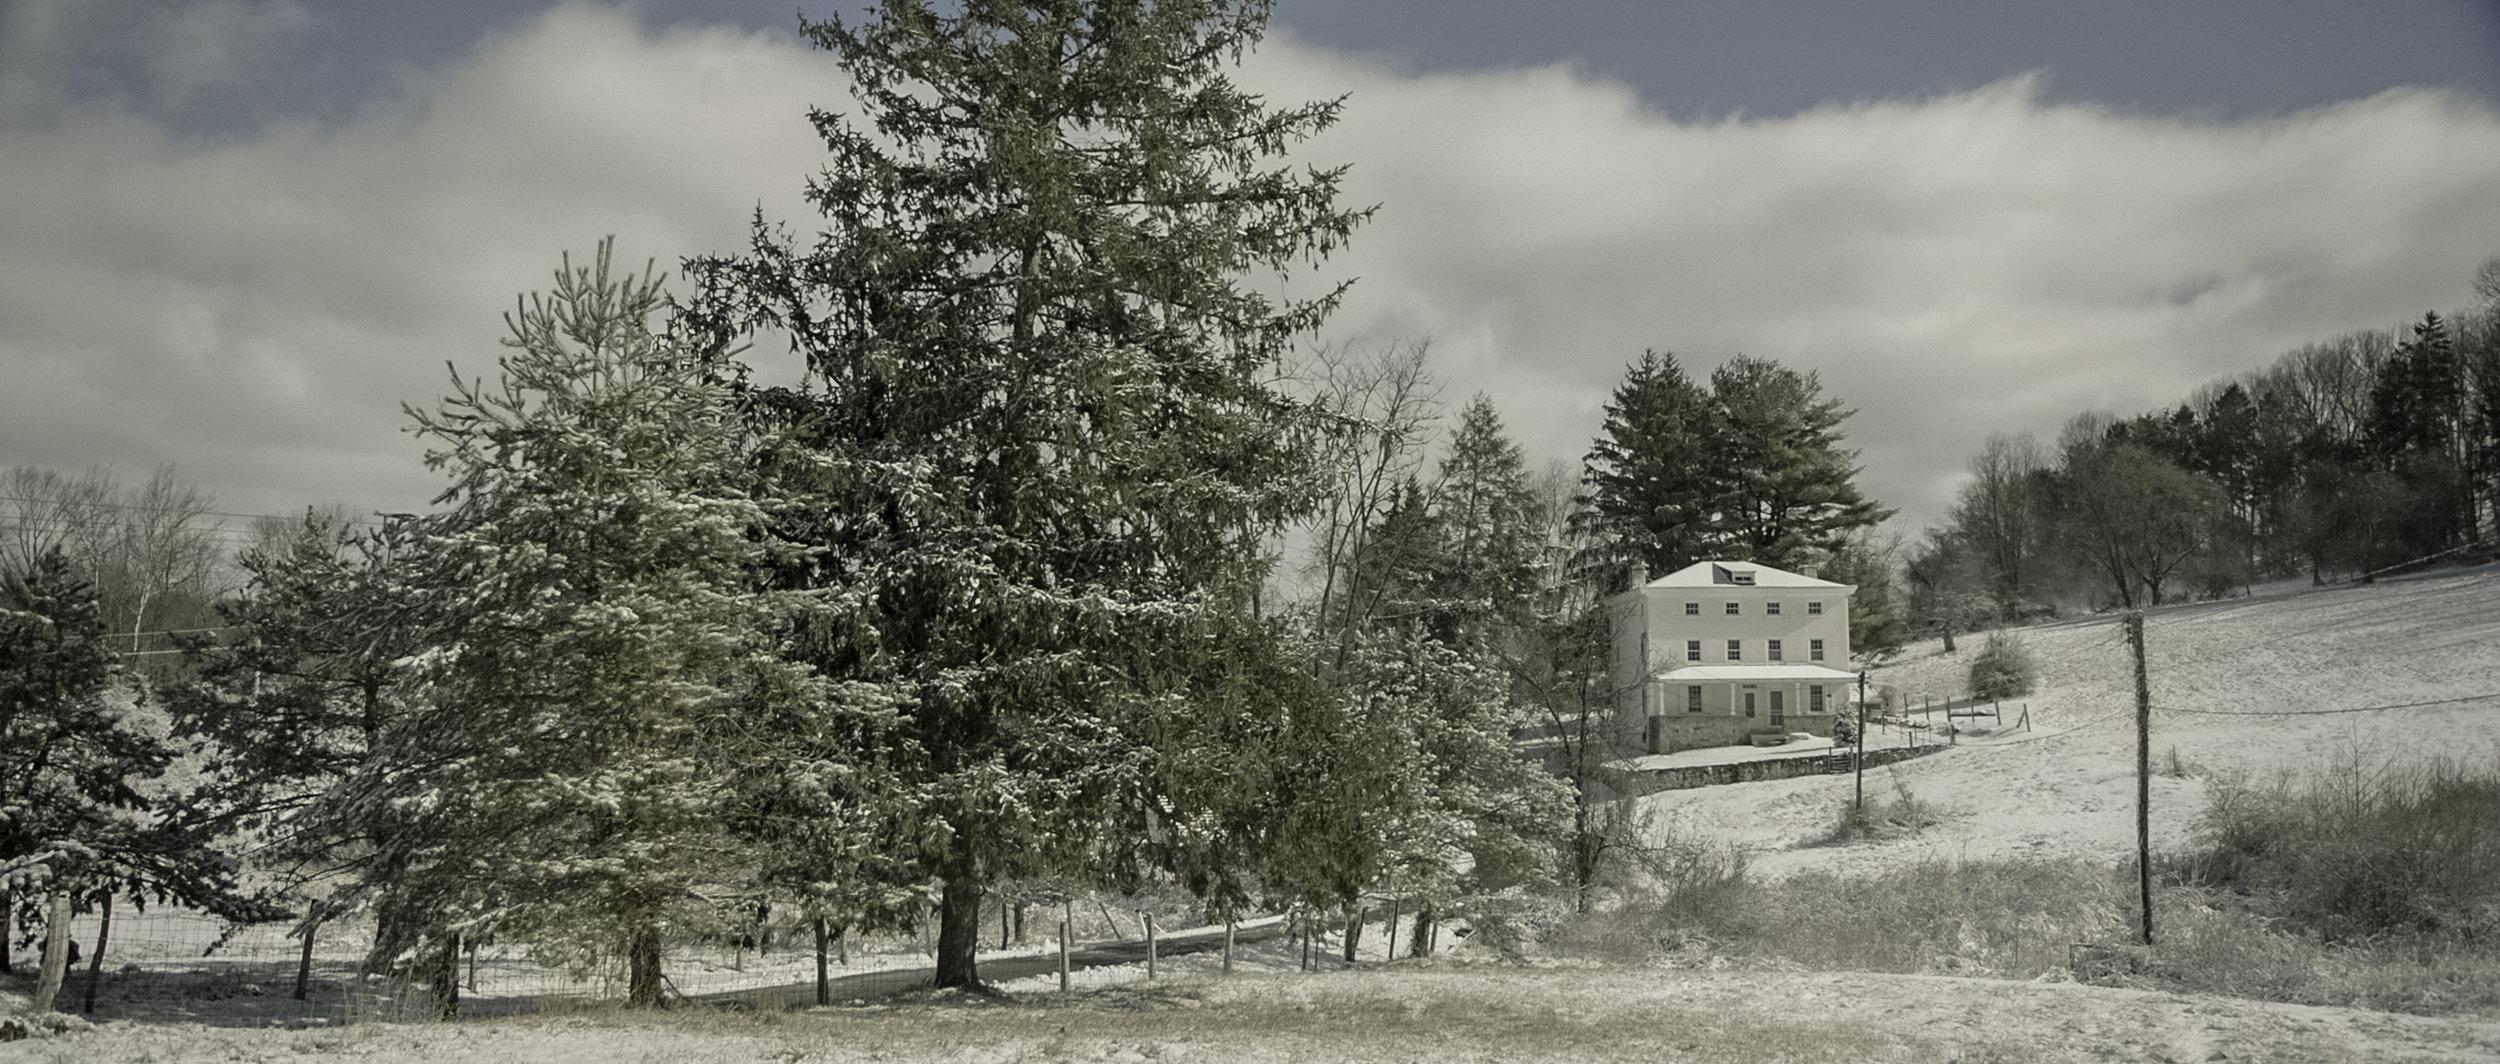 Wyeth_Snow-9.jpg